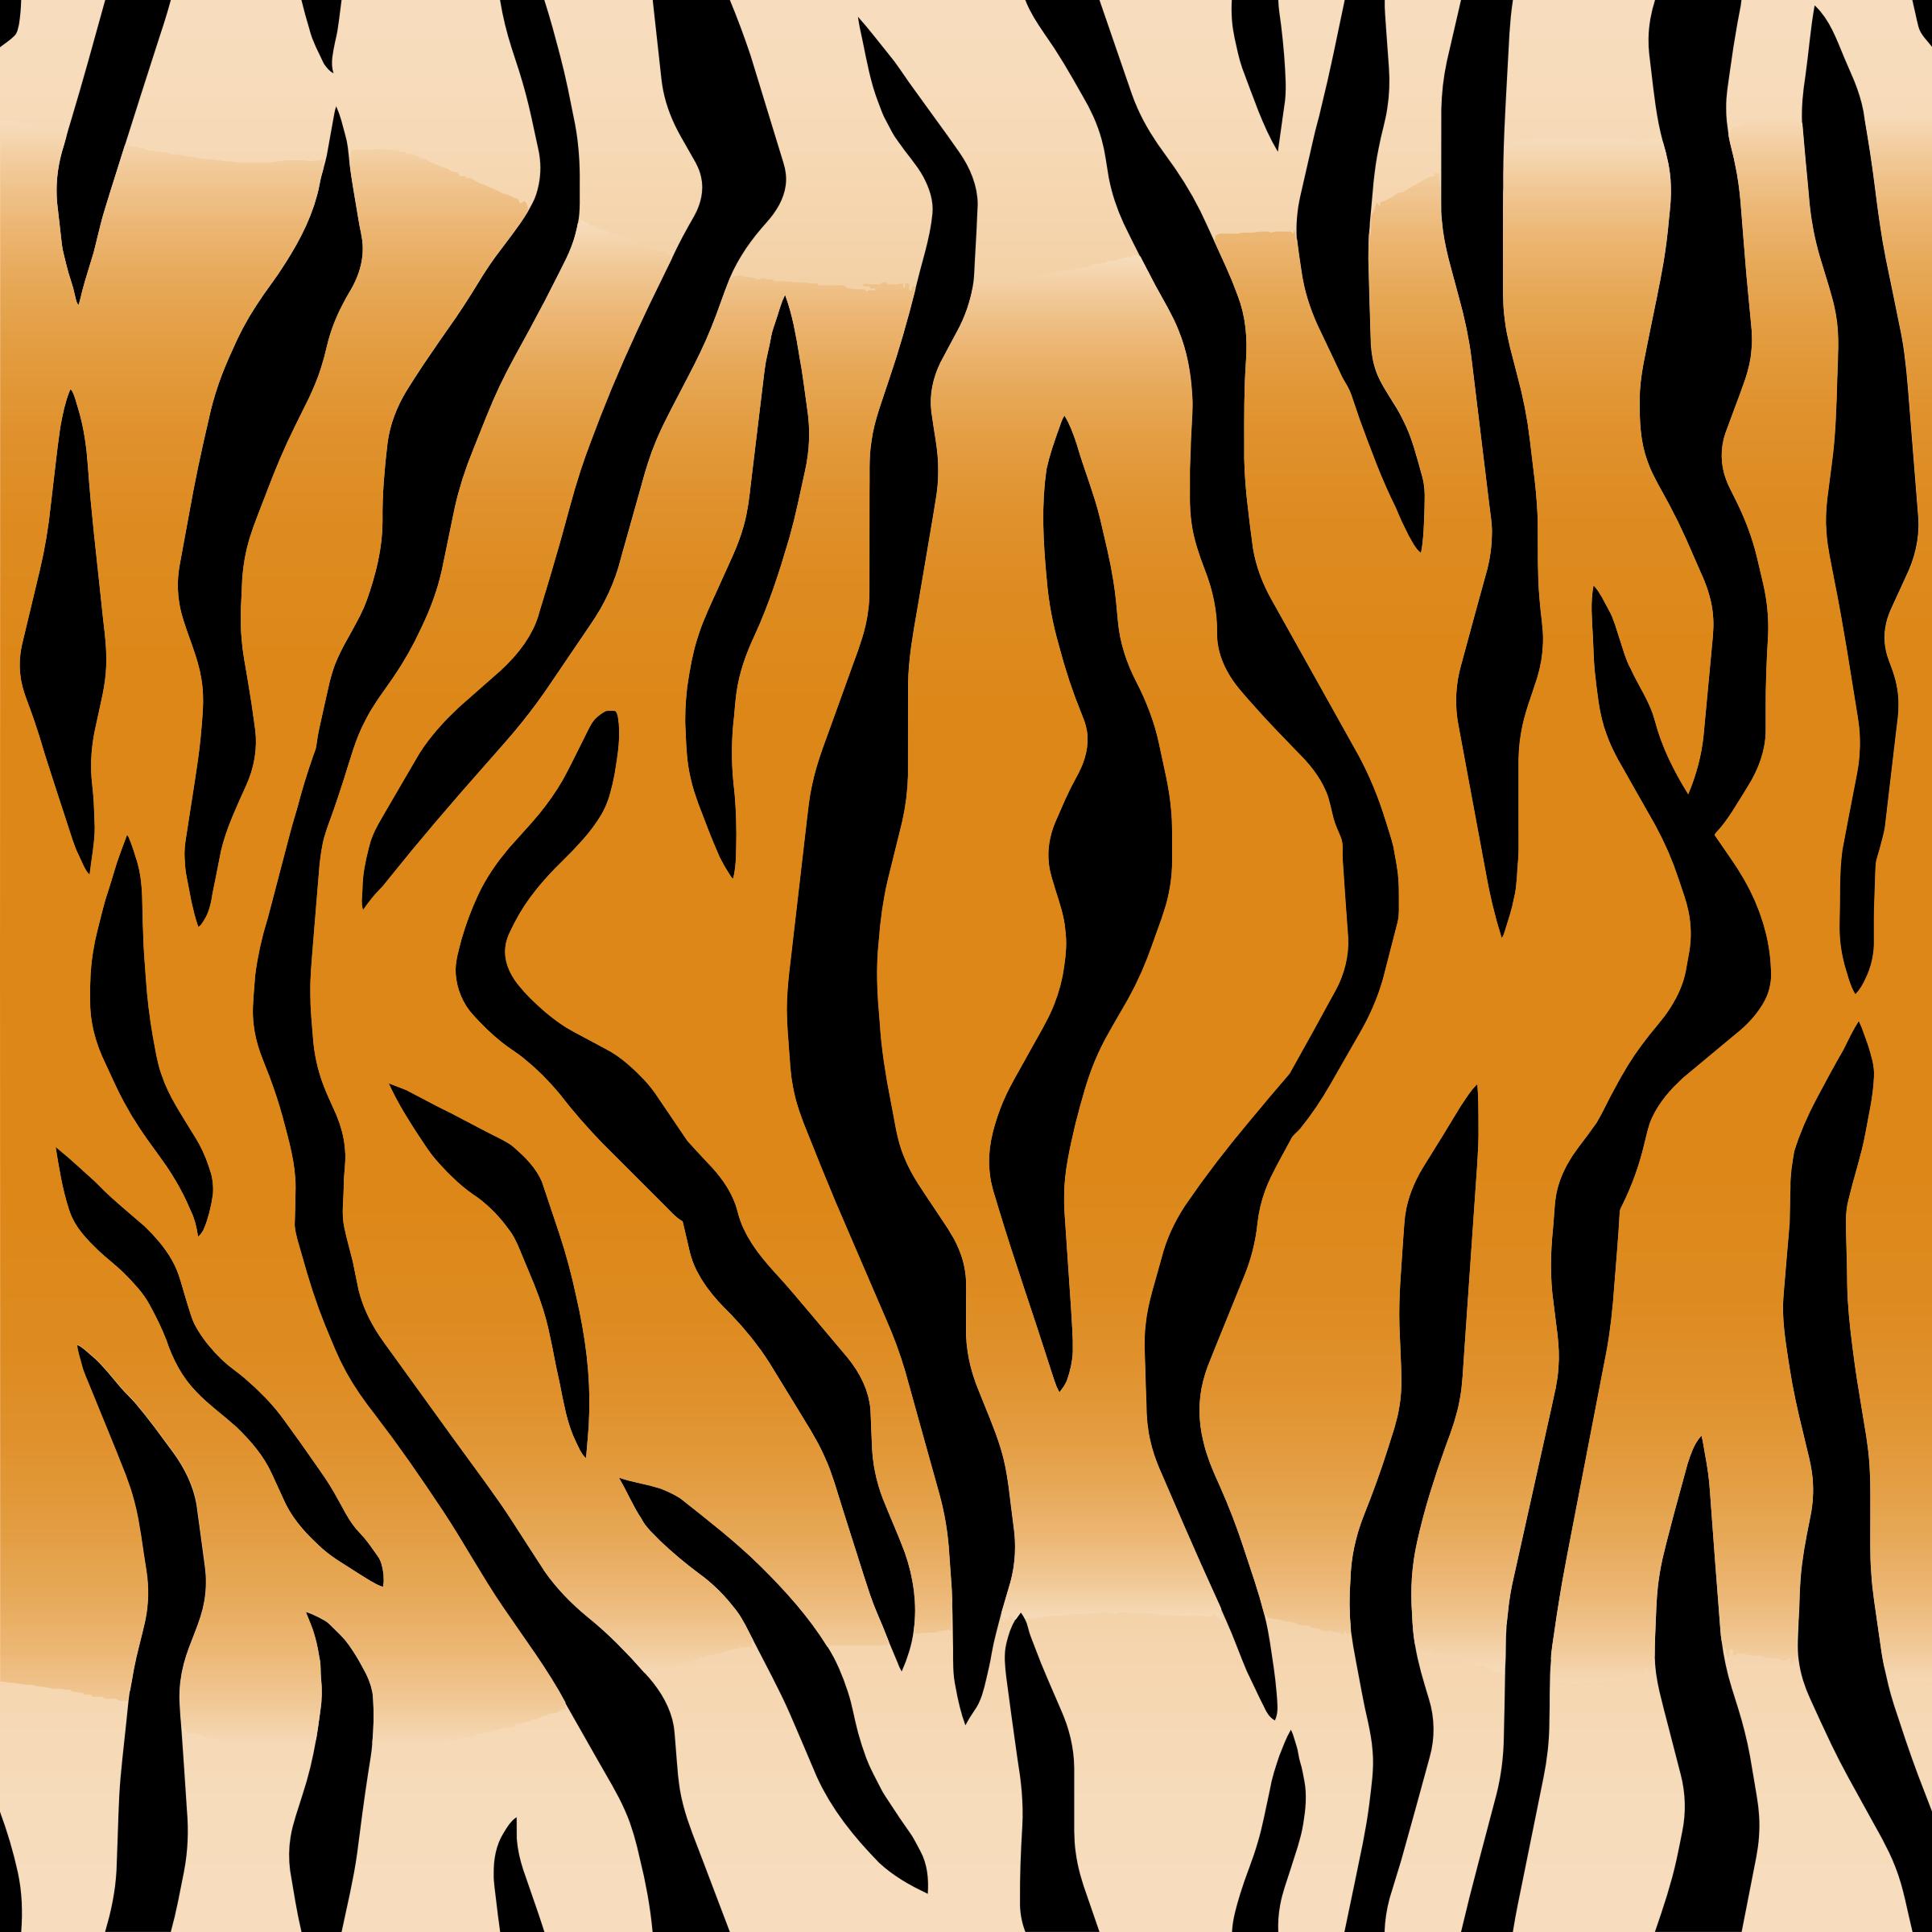 Animal Stripes Clipart.